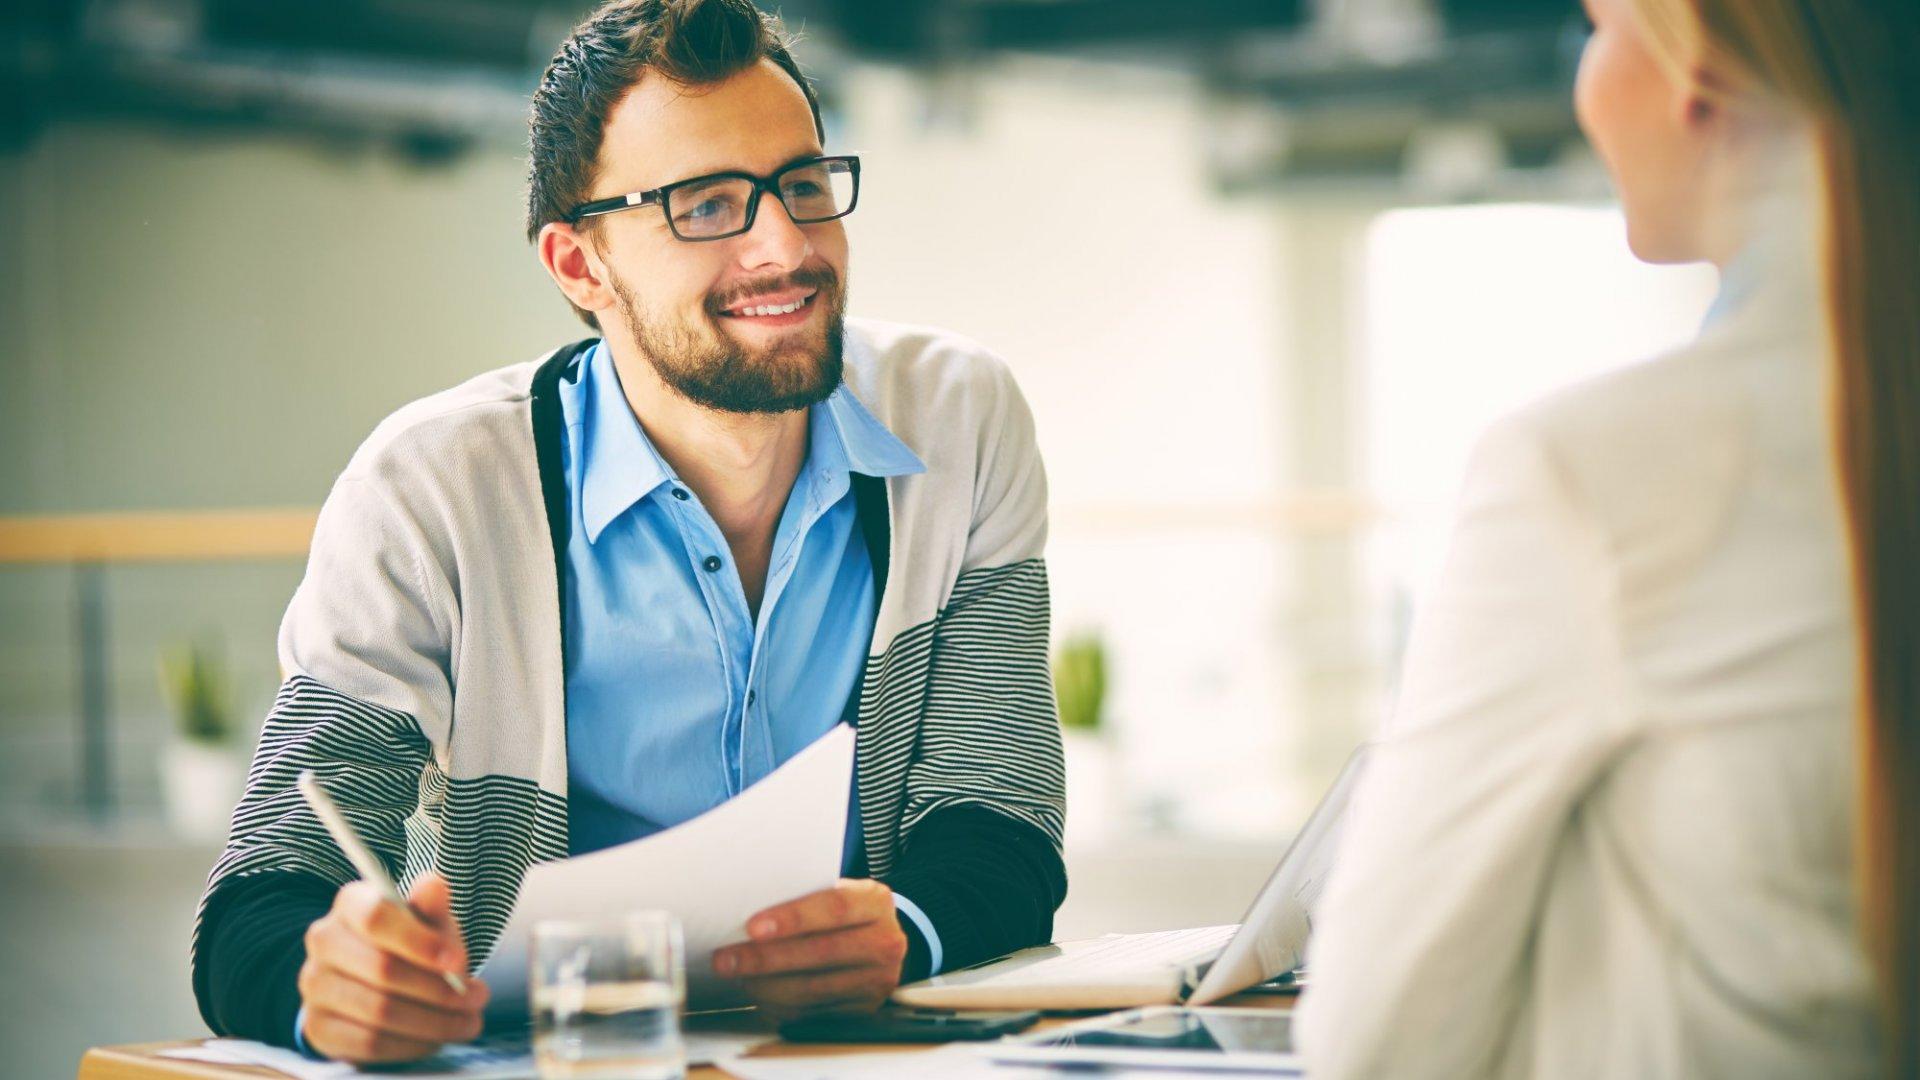 5 Job Interview Secrets Nobody Tells You